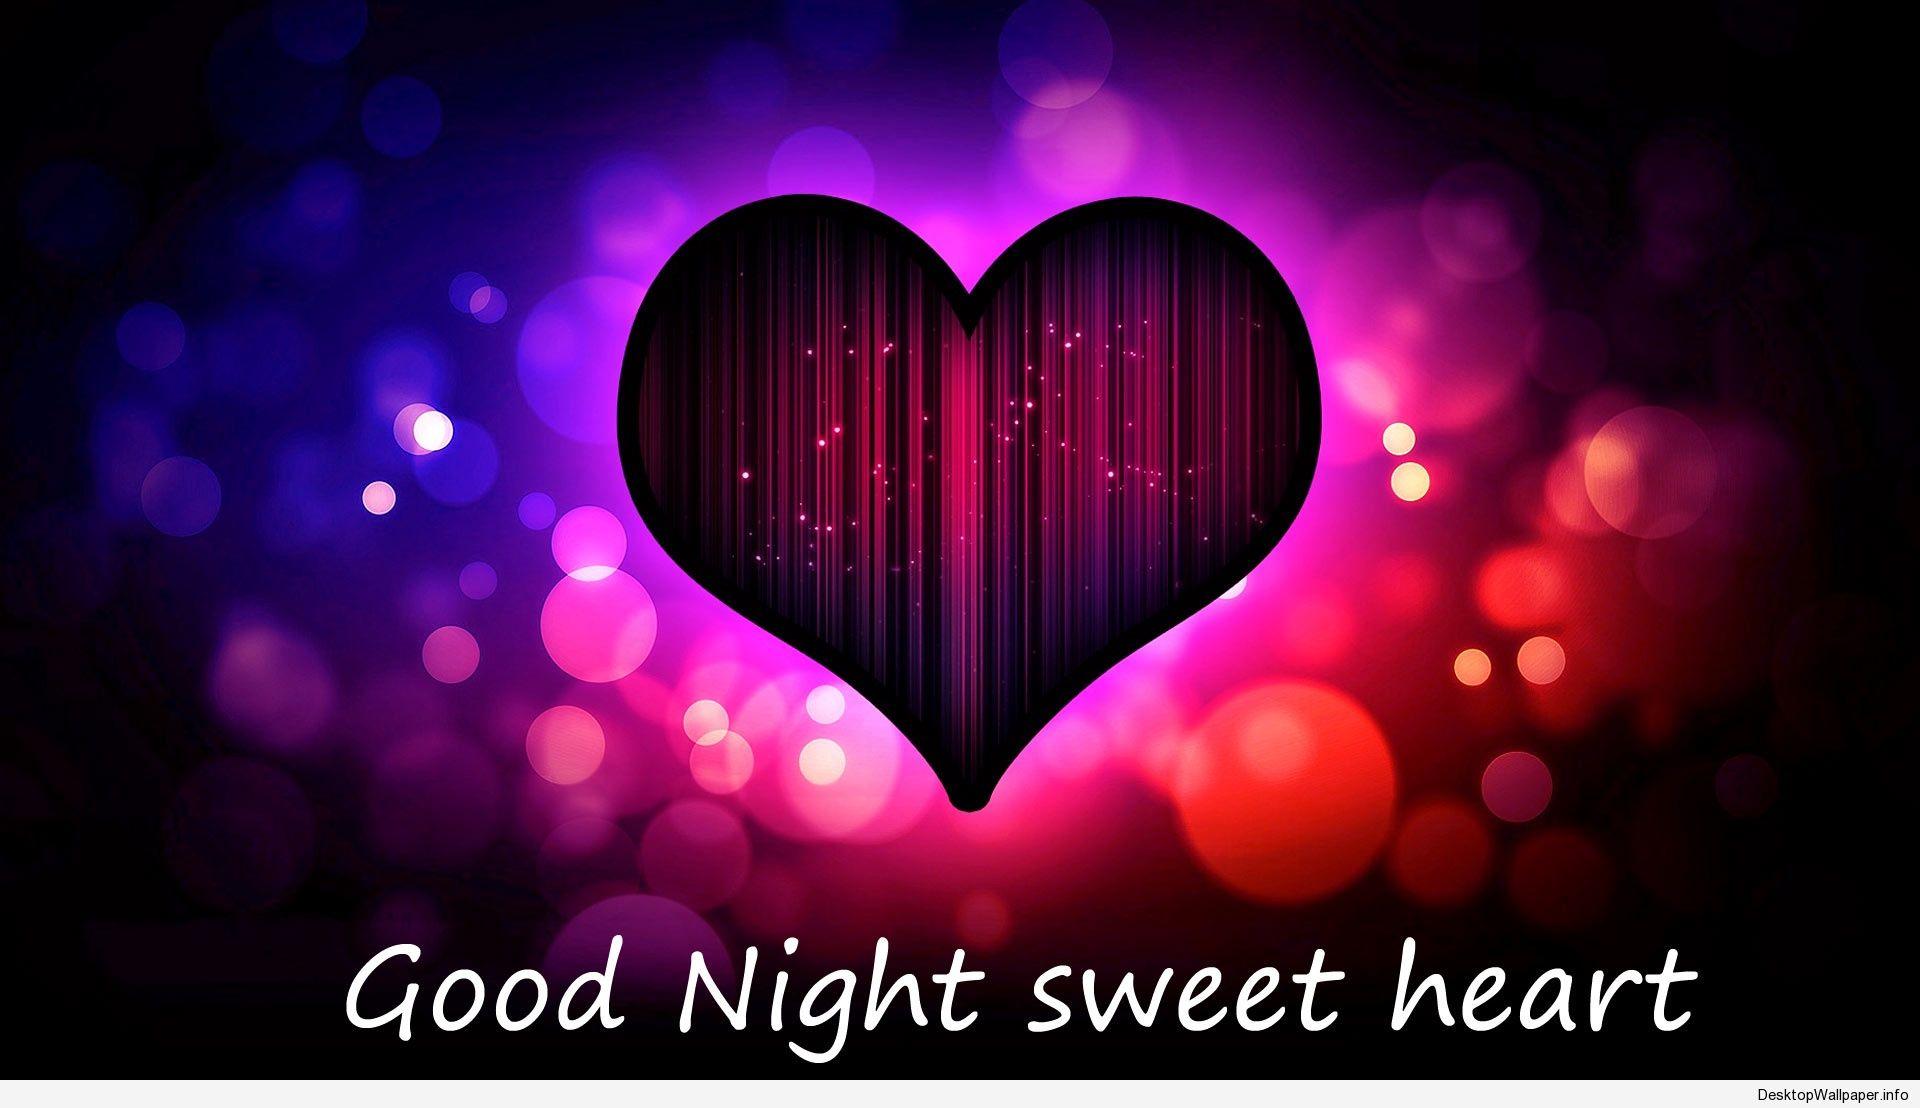 Good Night Wallpaper Love Http Desktopwallpaper Info Good Night Wallpaper Love 6527 Nigh Good Night Love Images Good Night Wallpaper Good Night Images Hd